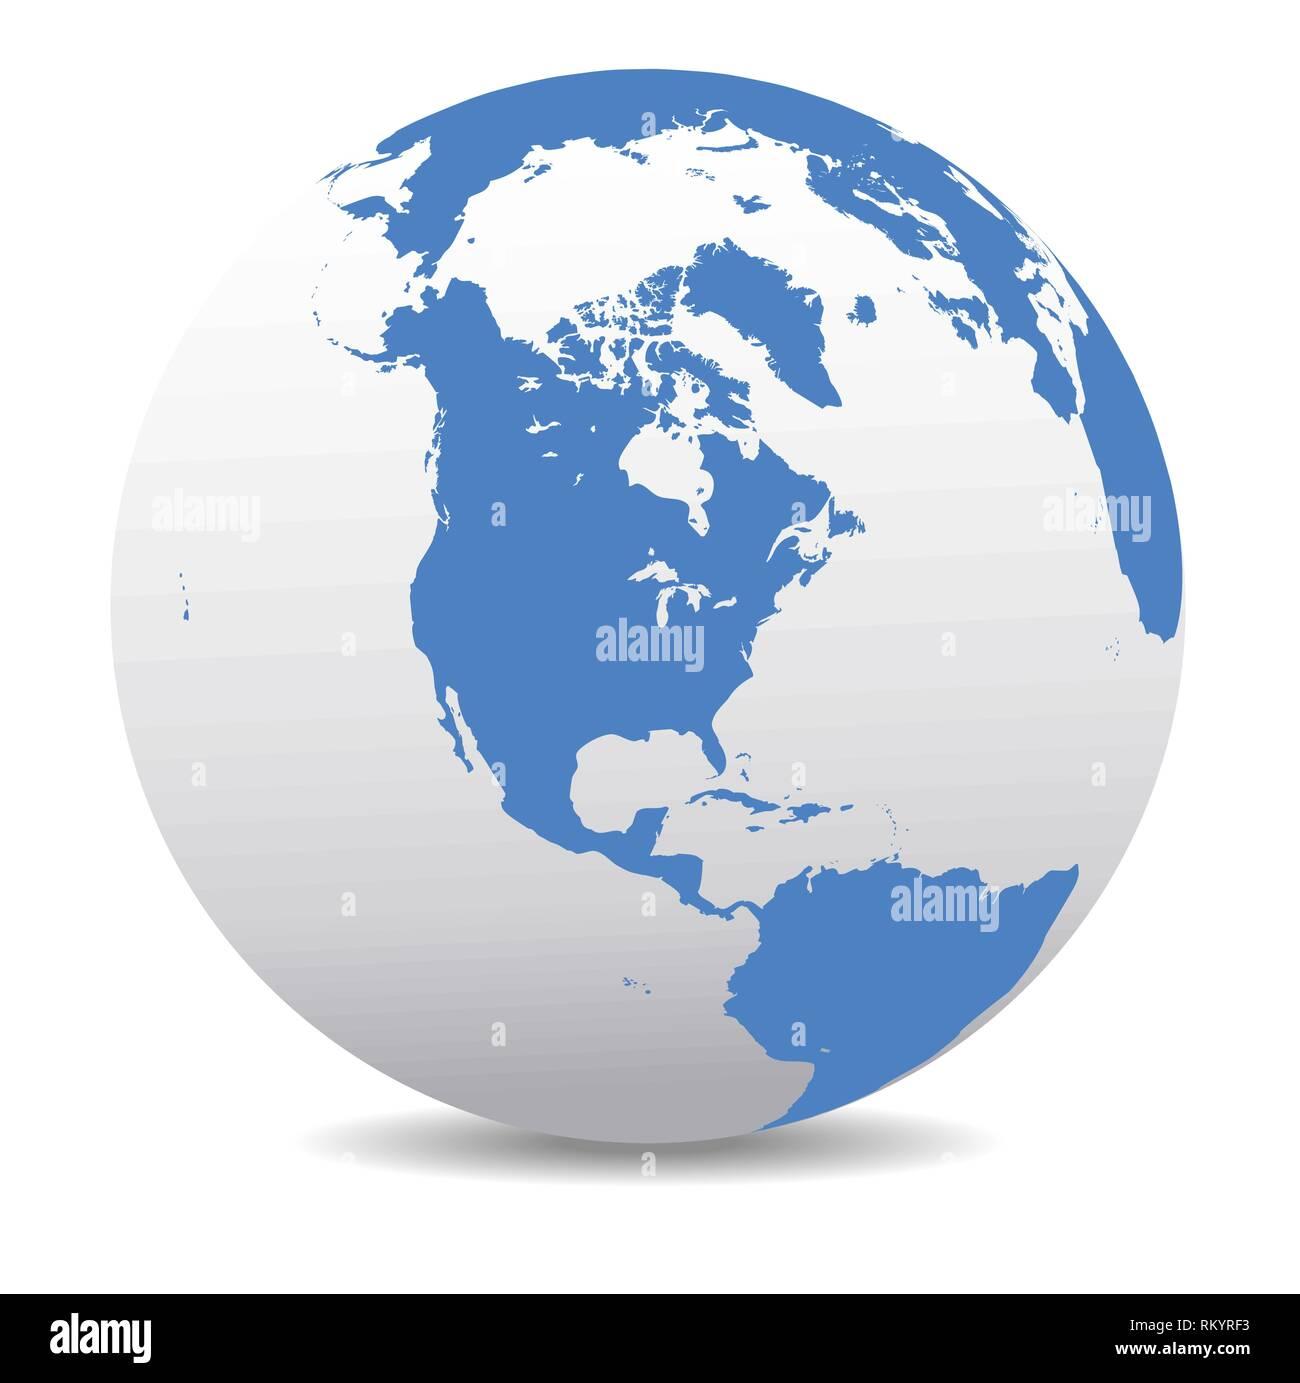 Karte Südamerika Und Nordamerika.Nordamerika Südamerika Globalen Welt Vektor Symbol Karte Der Welt